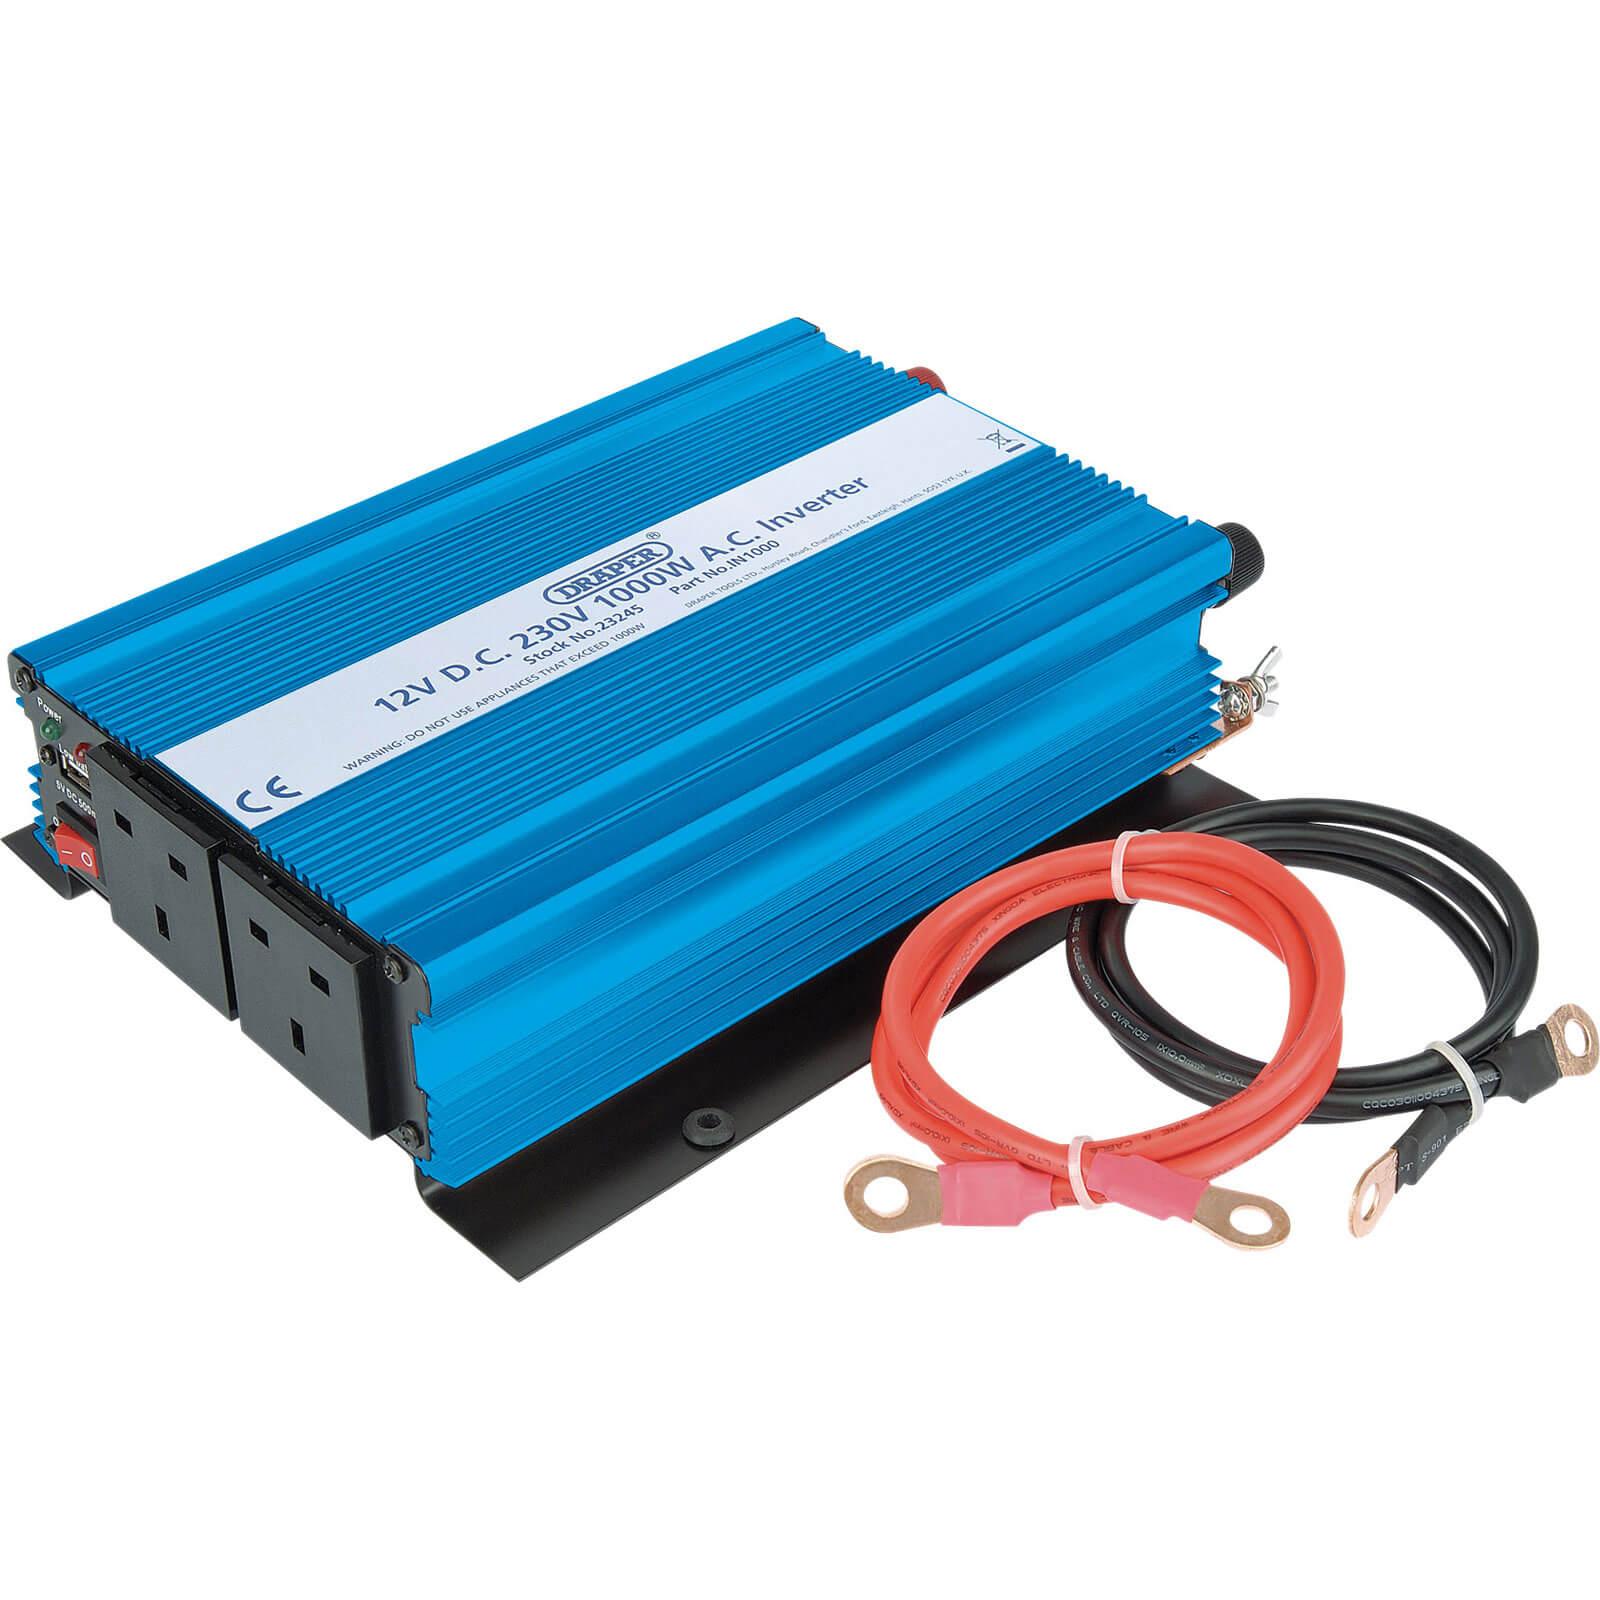 Draper DC-AC Inverter